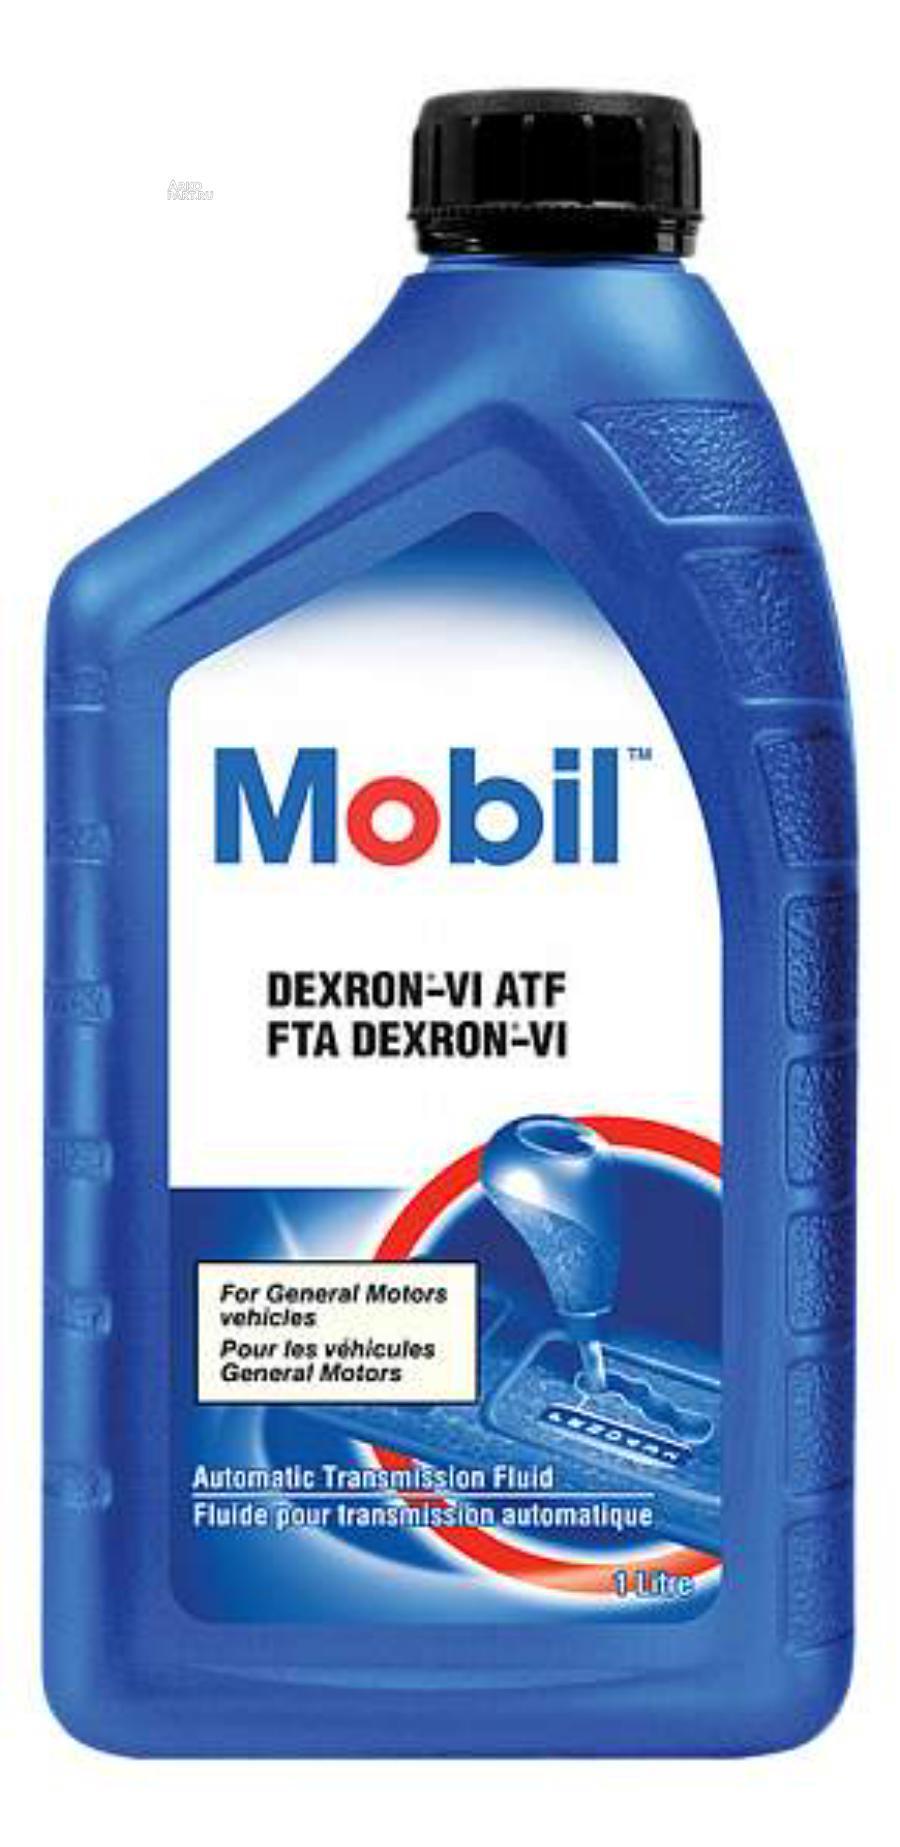 MOBIL DEXRON VI ATF 12X1L